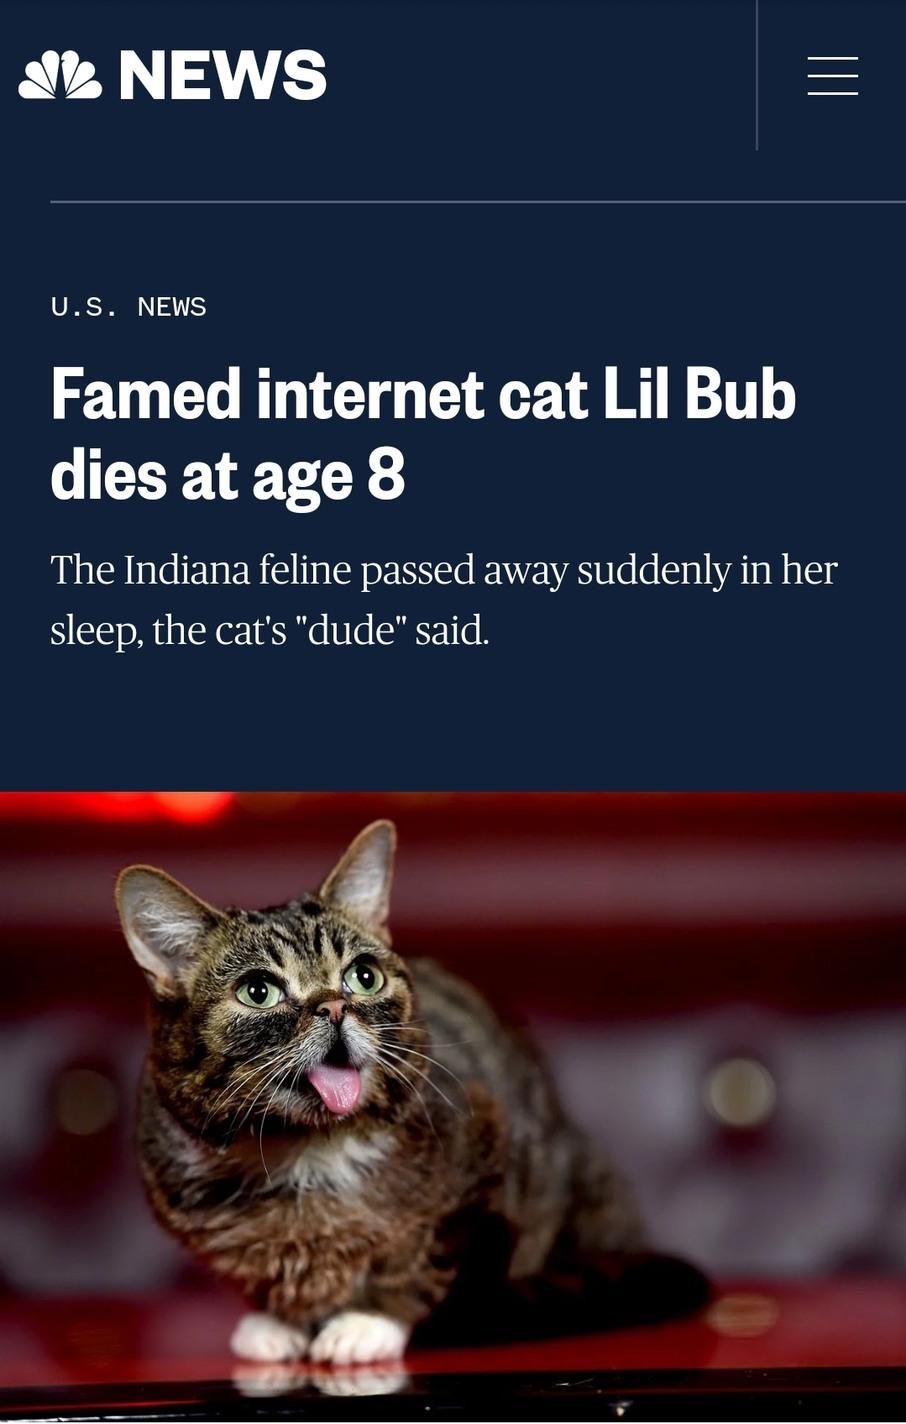 RIP, lil' Bub...I really didn't need sad news right now ;__; - meme